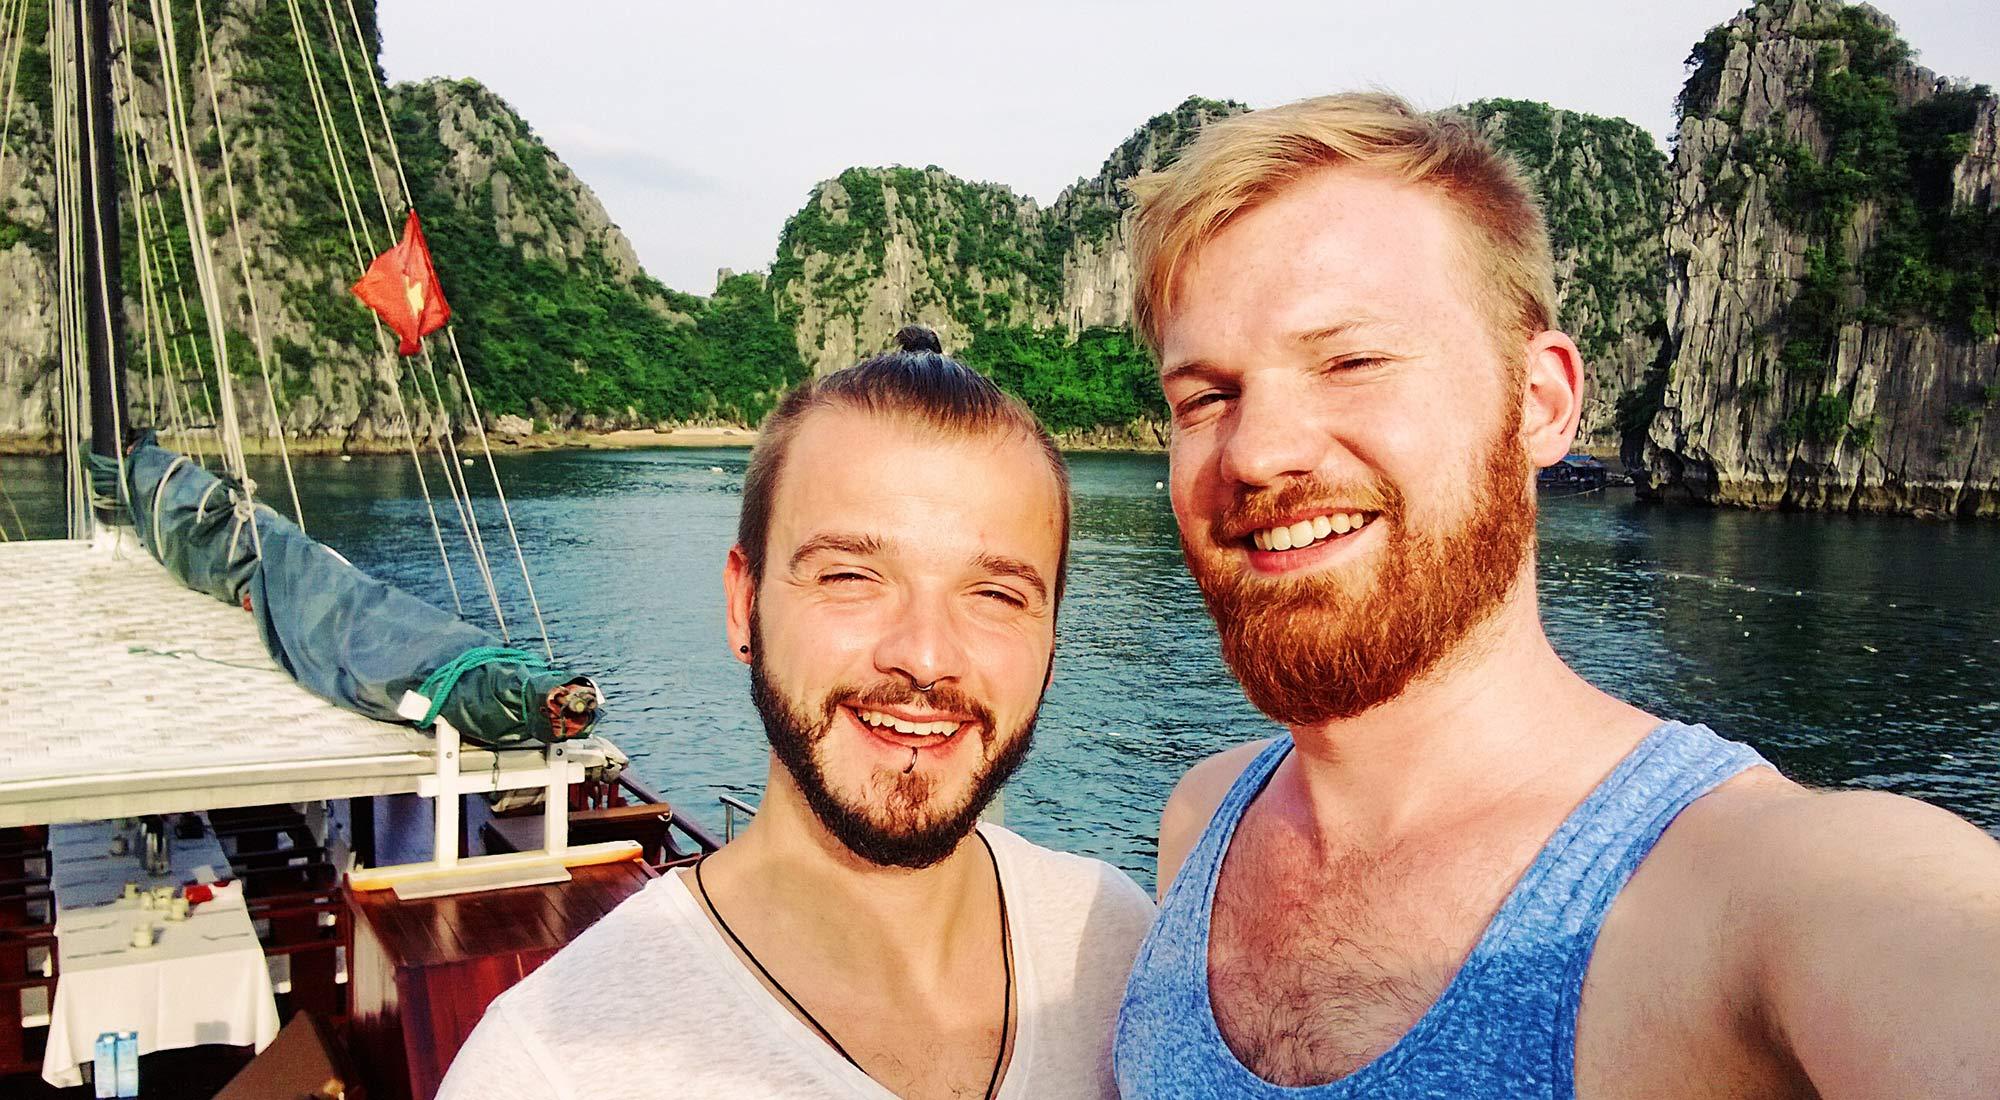 Gay Travel Blogger Karl & Daan on a Halong Bay Cruise | Top Highlights Best Photos Gay Couple Travel Vietnam © CoupleofMen.com